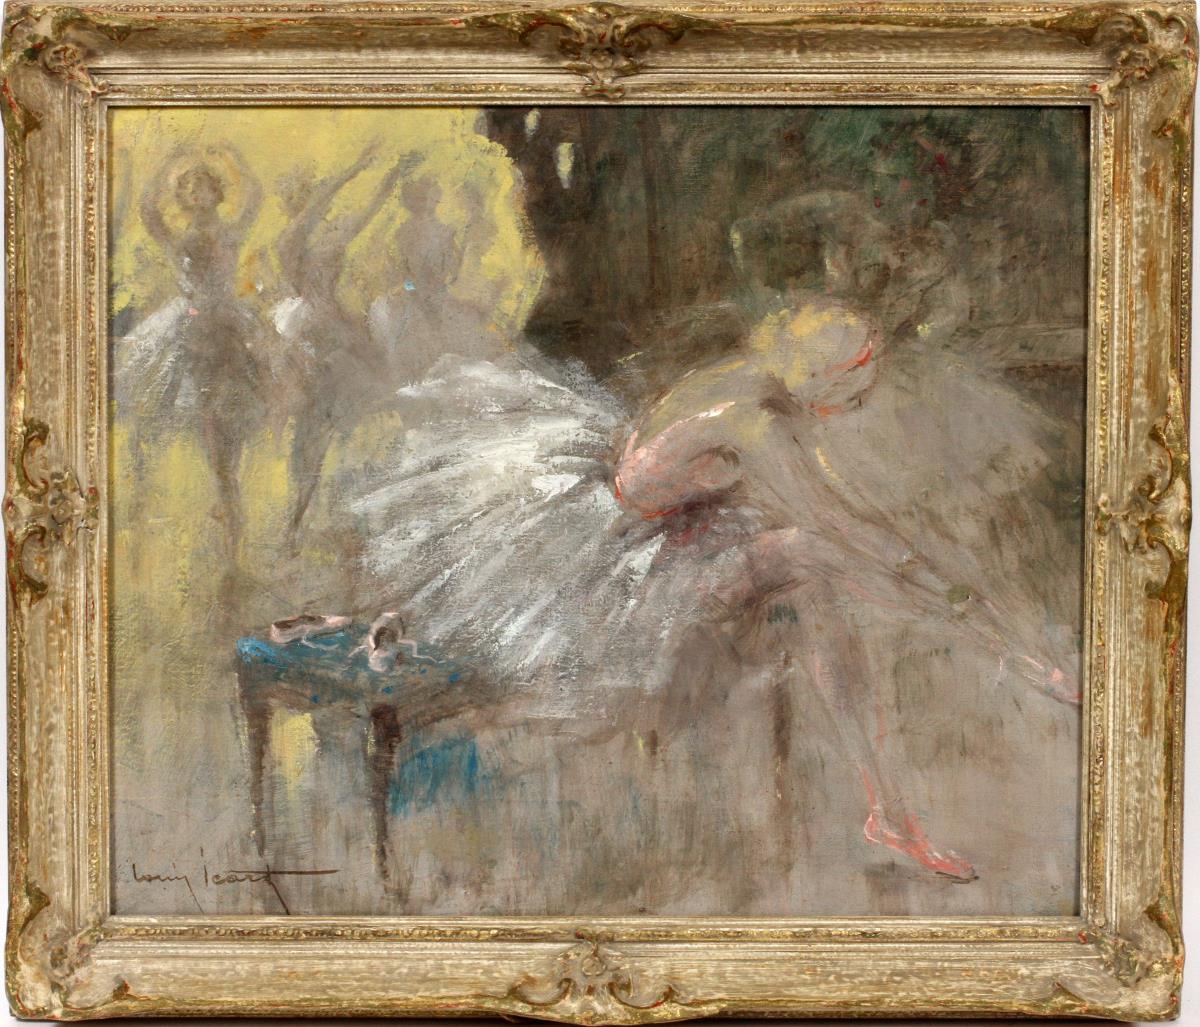 Icart oil painting, untitled, DuMouchelle lot #2053